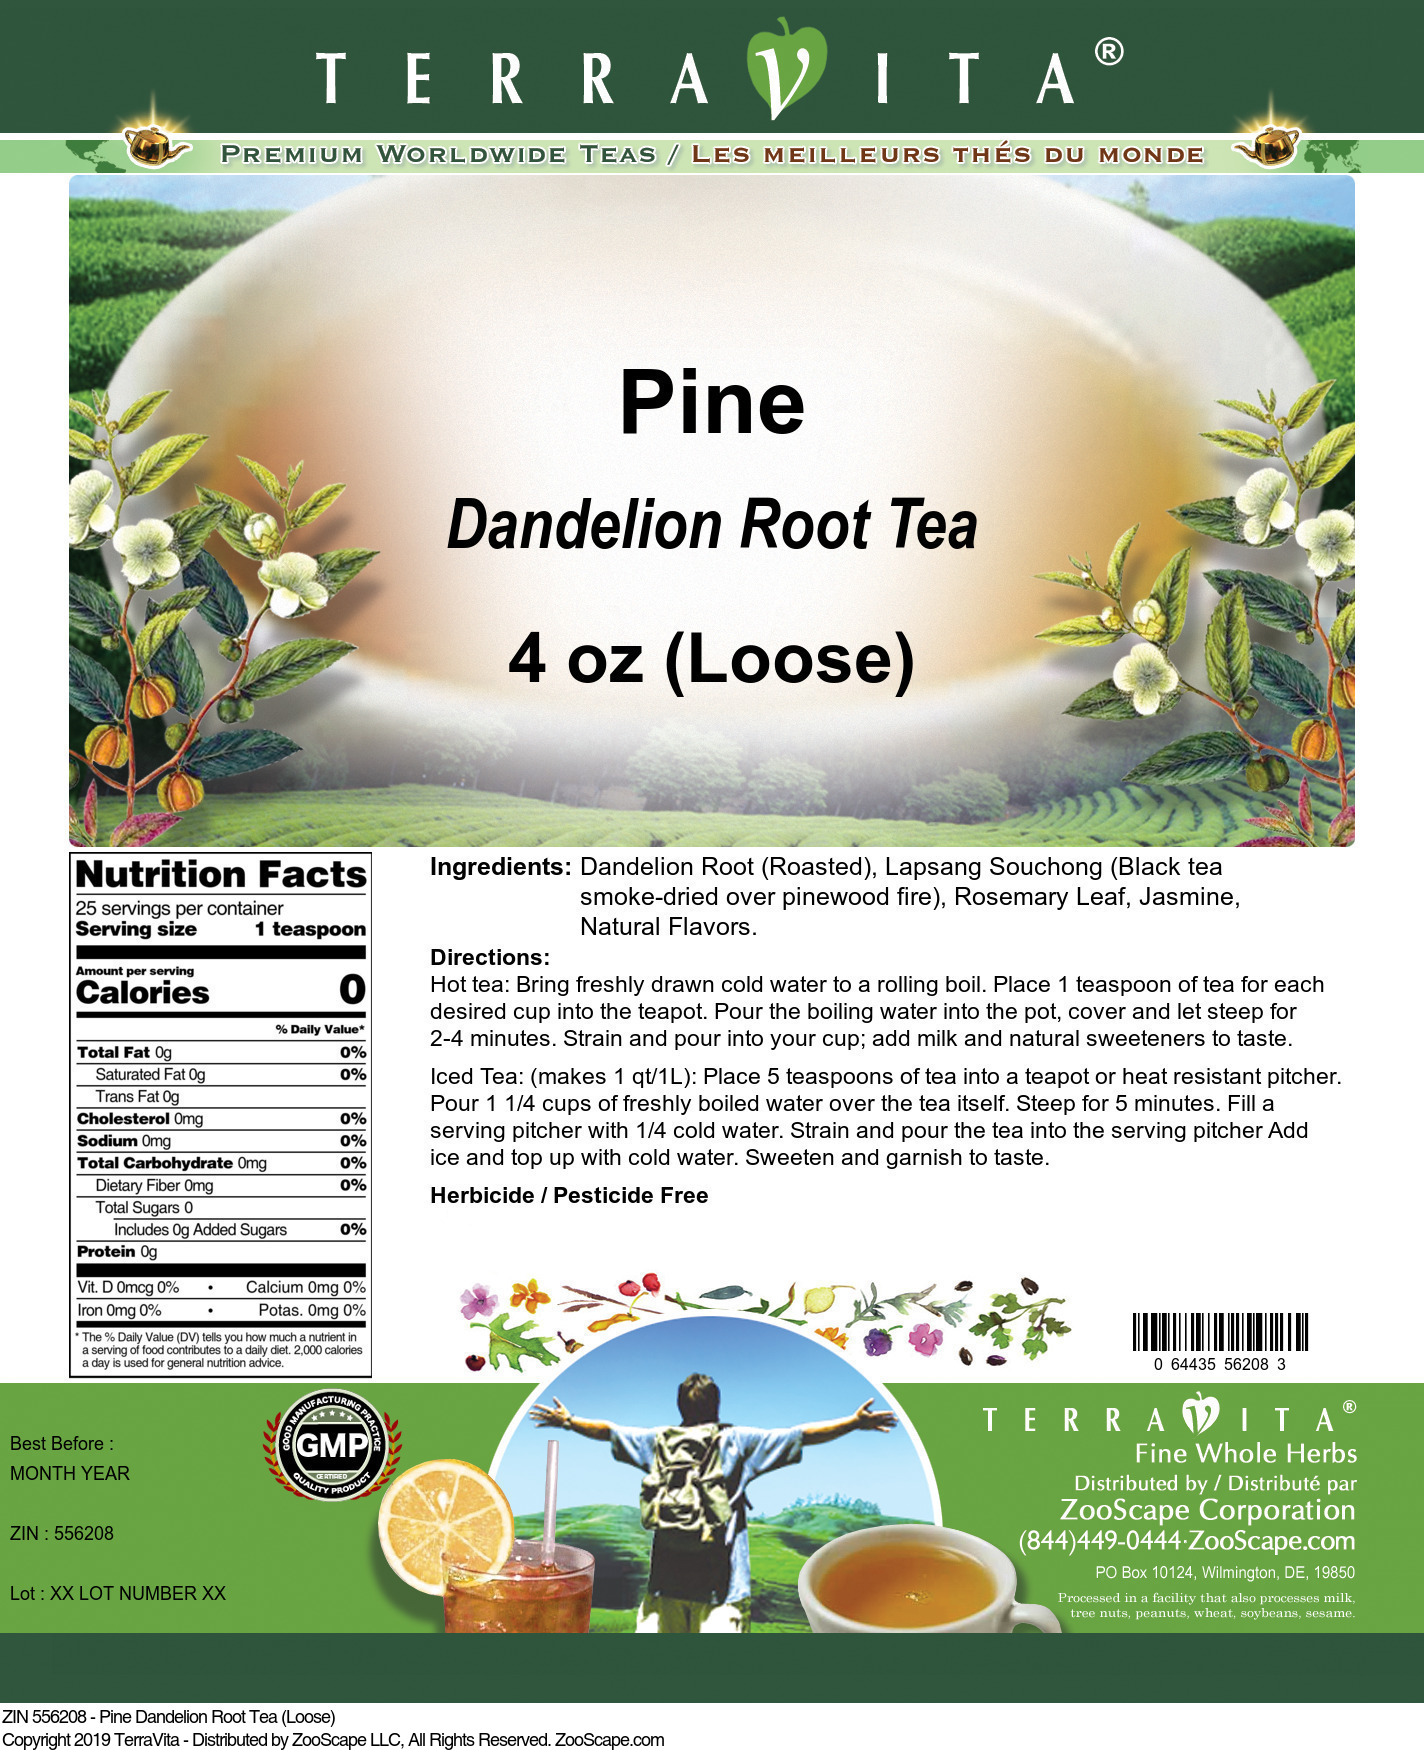 Pine Dandelion Root Tea (Loose)